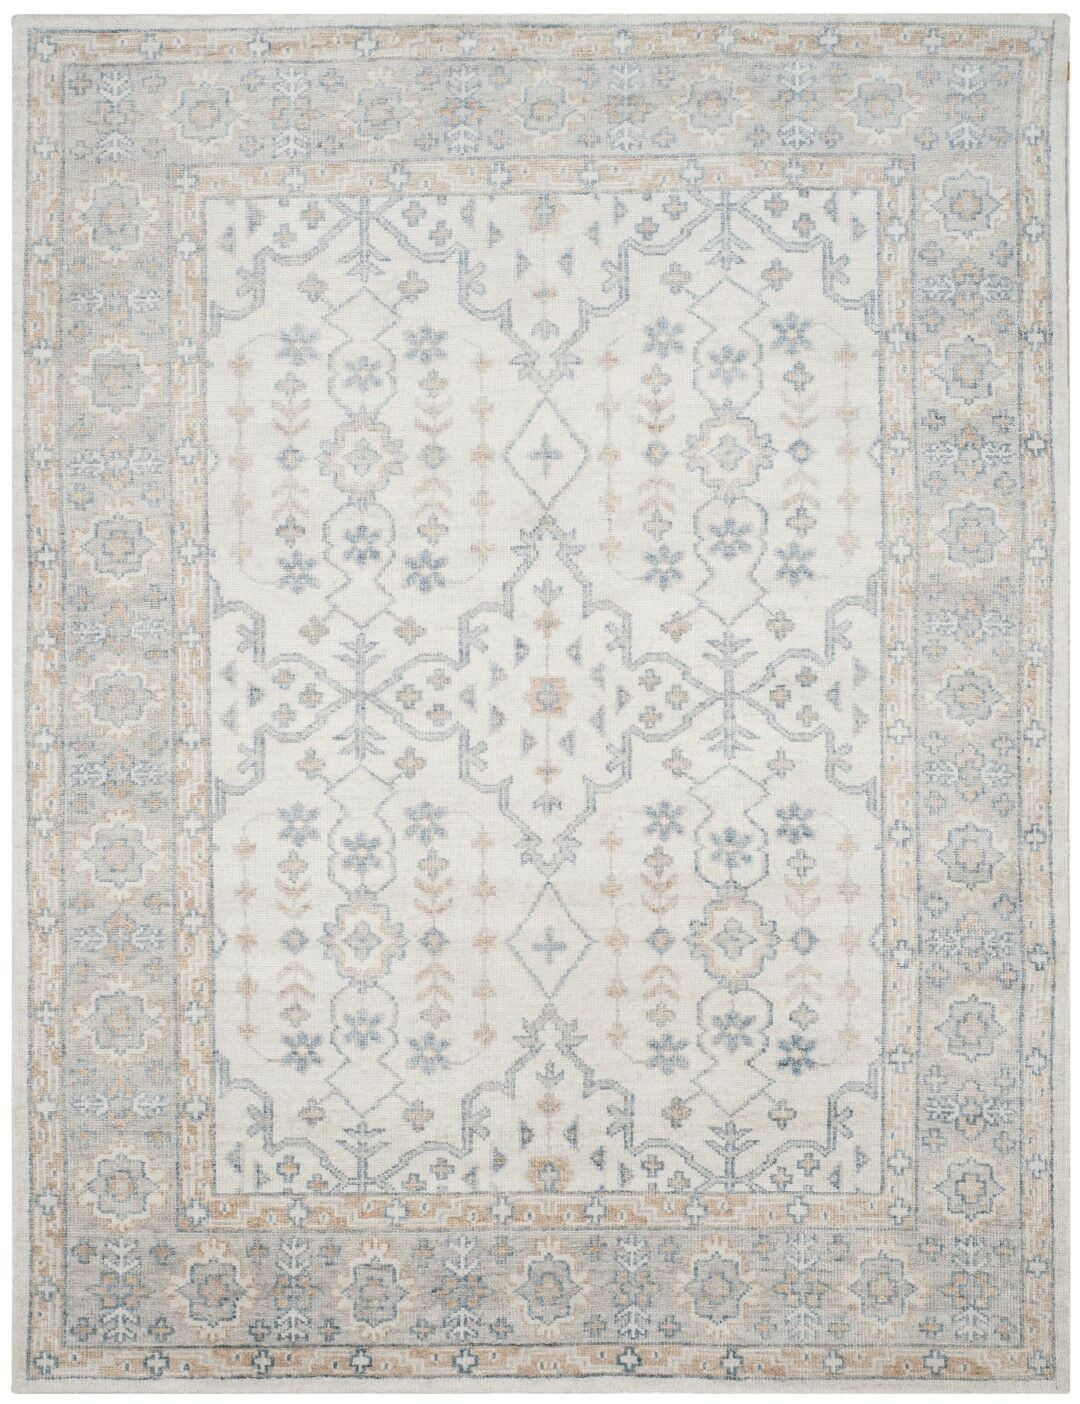 Yassine Hand-Knotted Ivory/Blue Area Rug Rug Size: Rectangle 4' x 6'